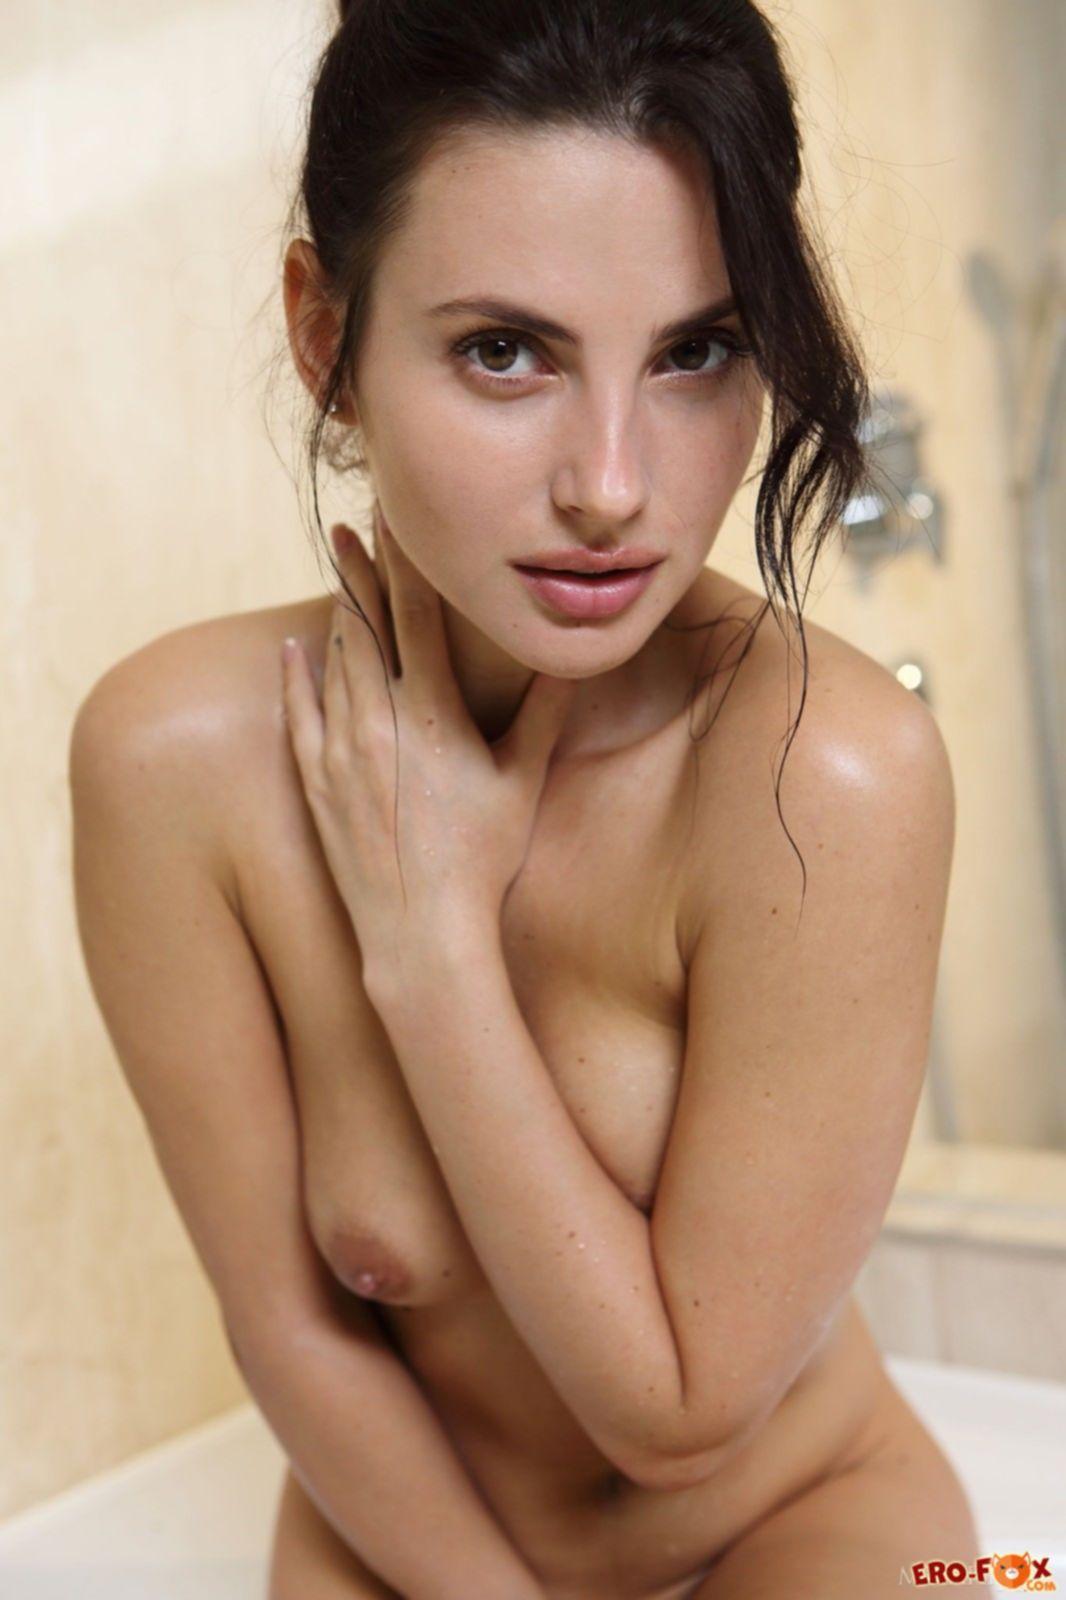 Голая брюнетка моется в ванне - фото